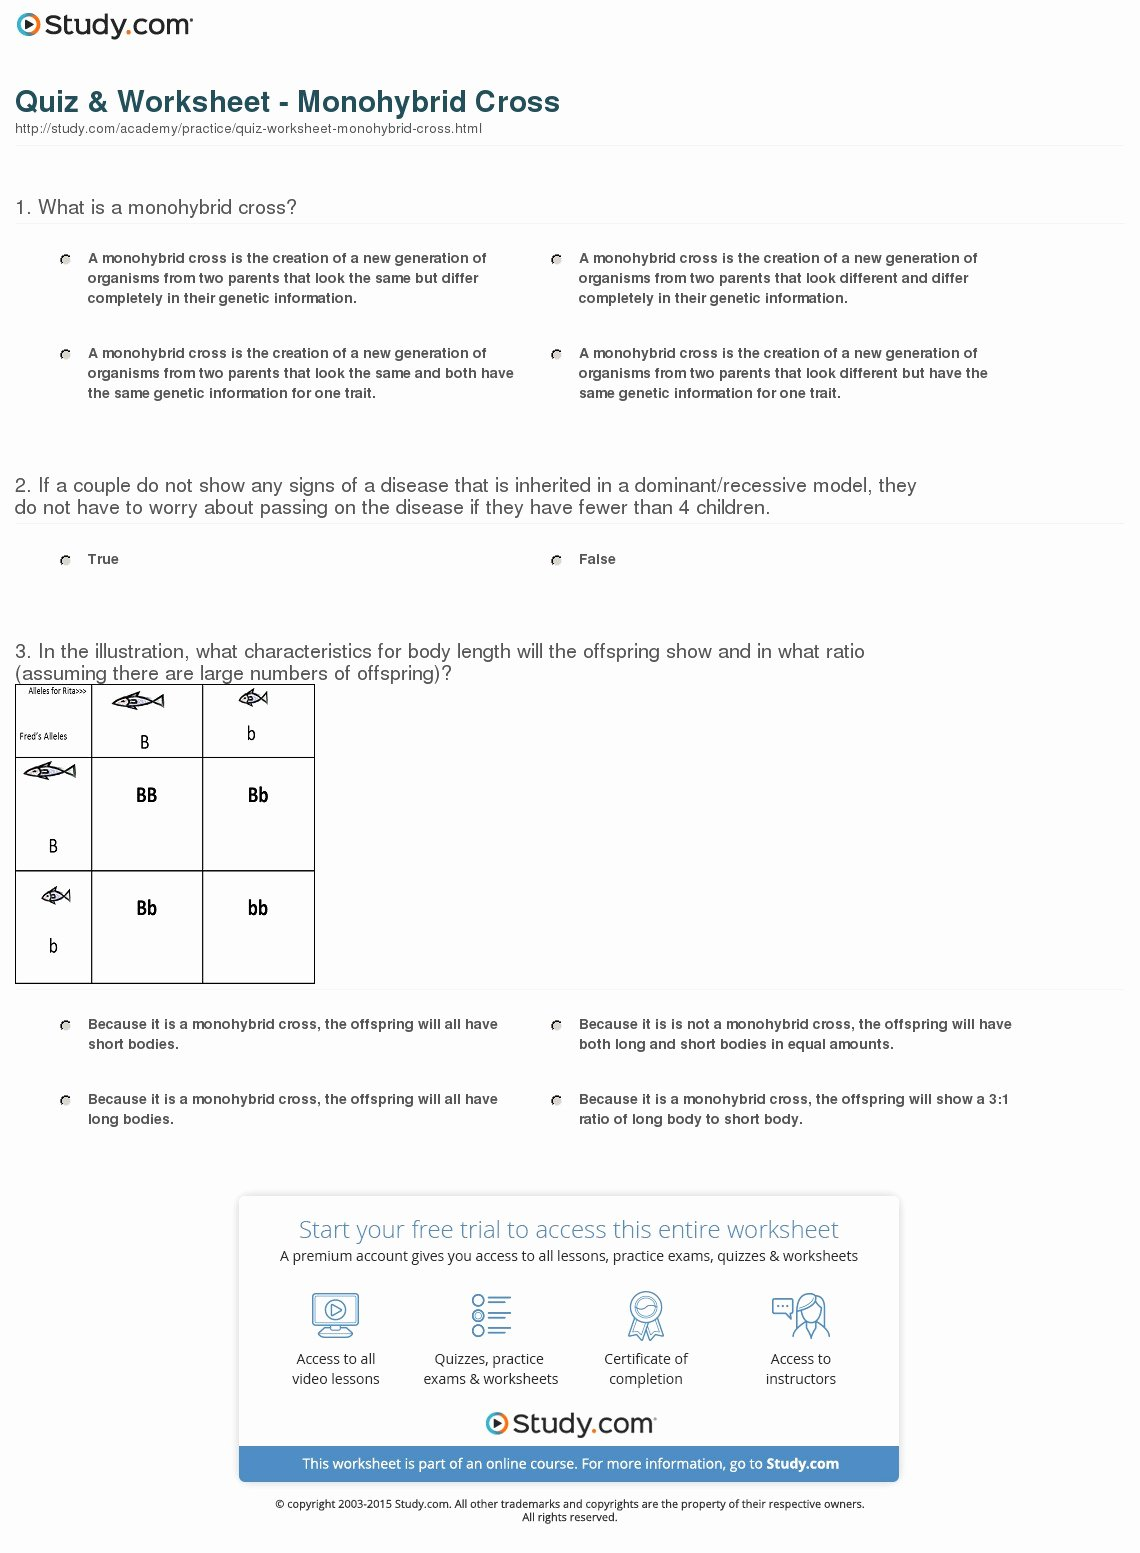 Monohybrid Cross Worksheet Answers Unique Quiz & Worksheet Monohybrid Cross